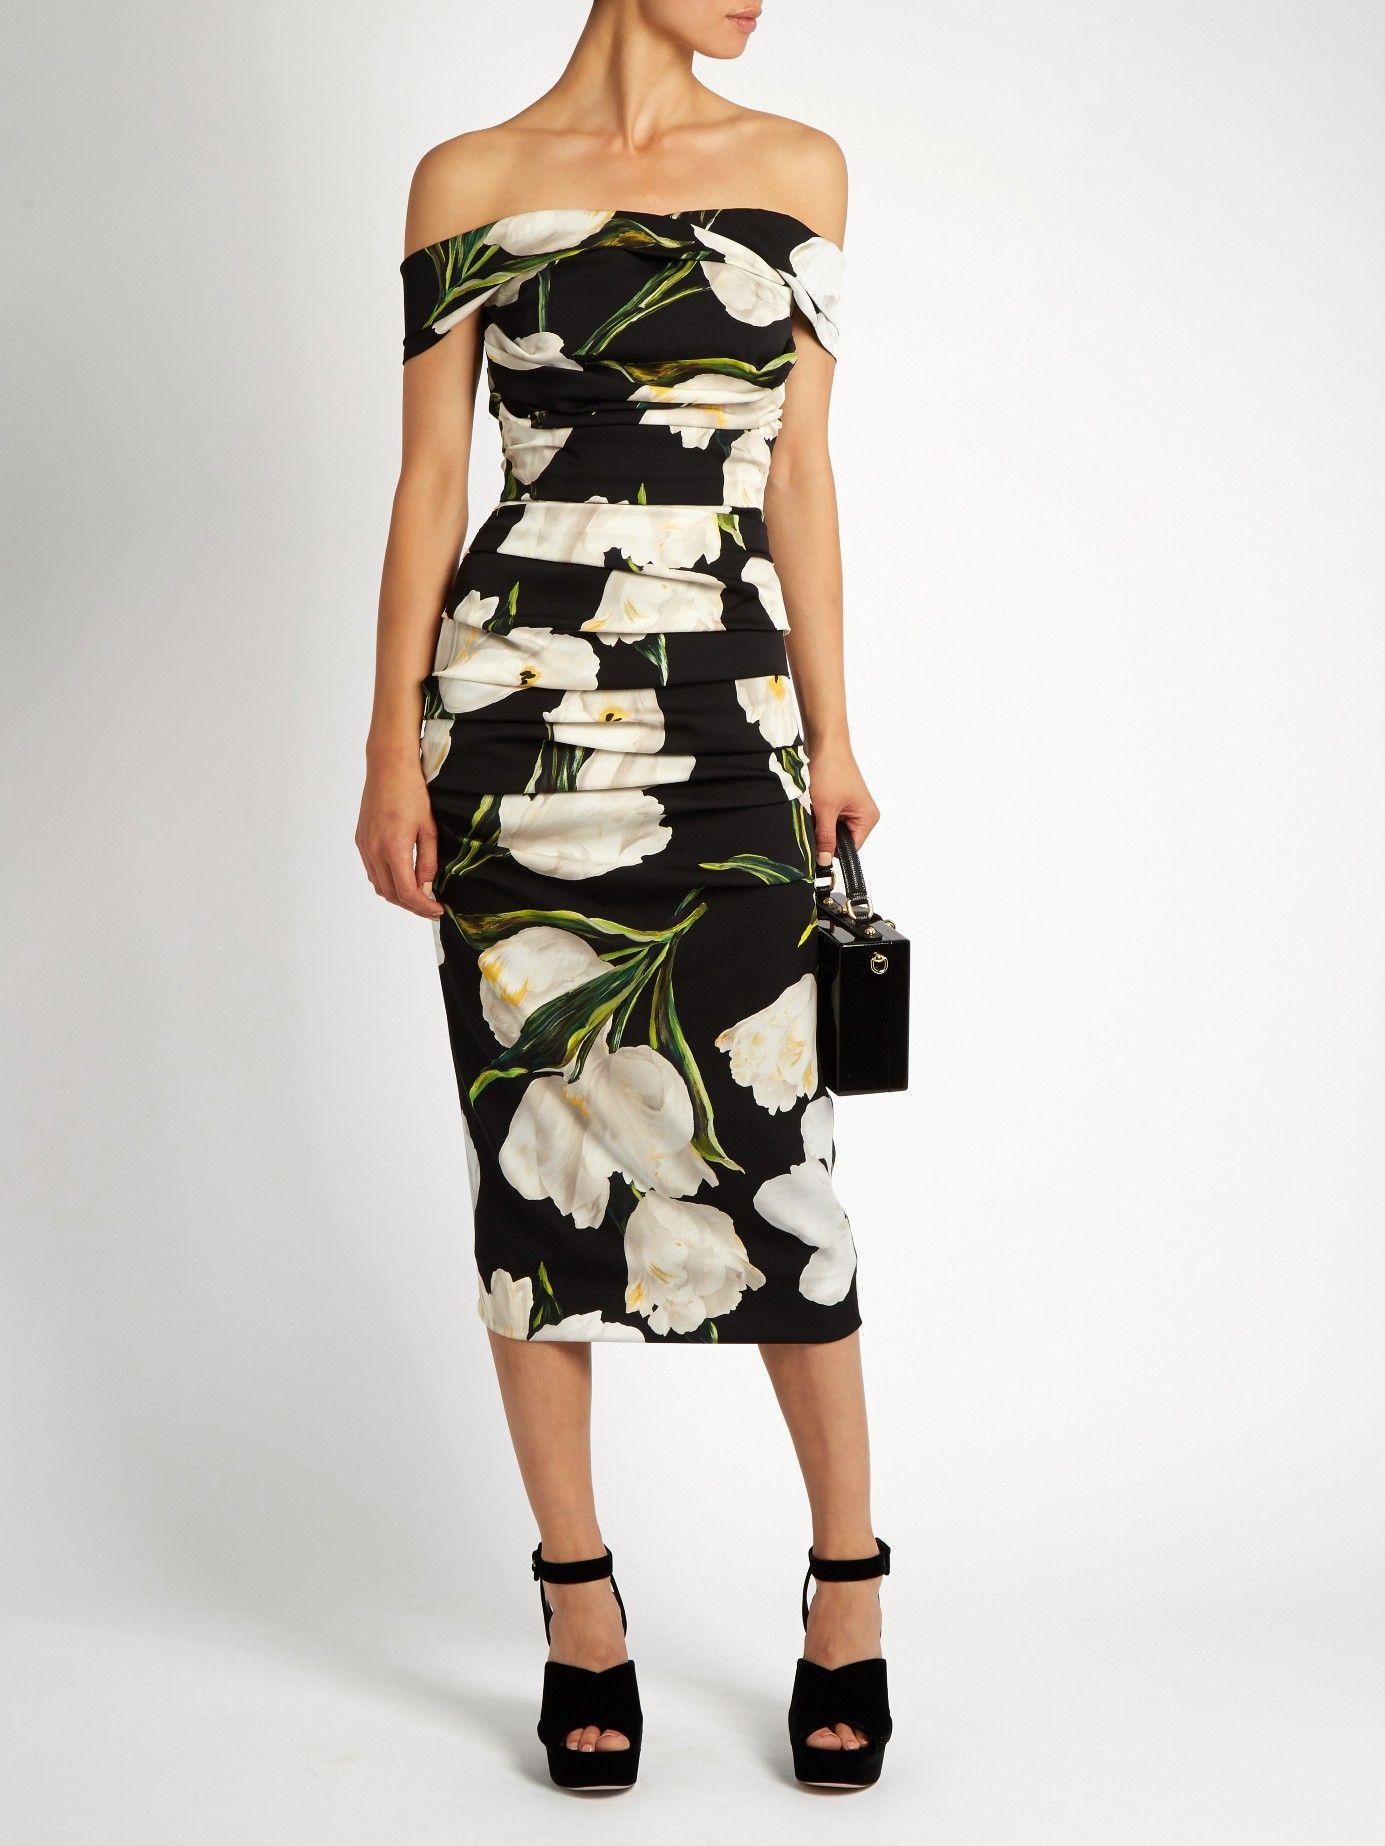 Tulip-print off-the-shoulder dress | Dolce & Gabbana | MATCHESFASHION.COM UK